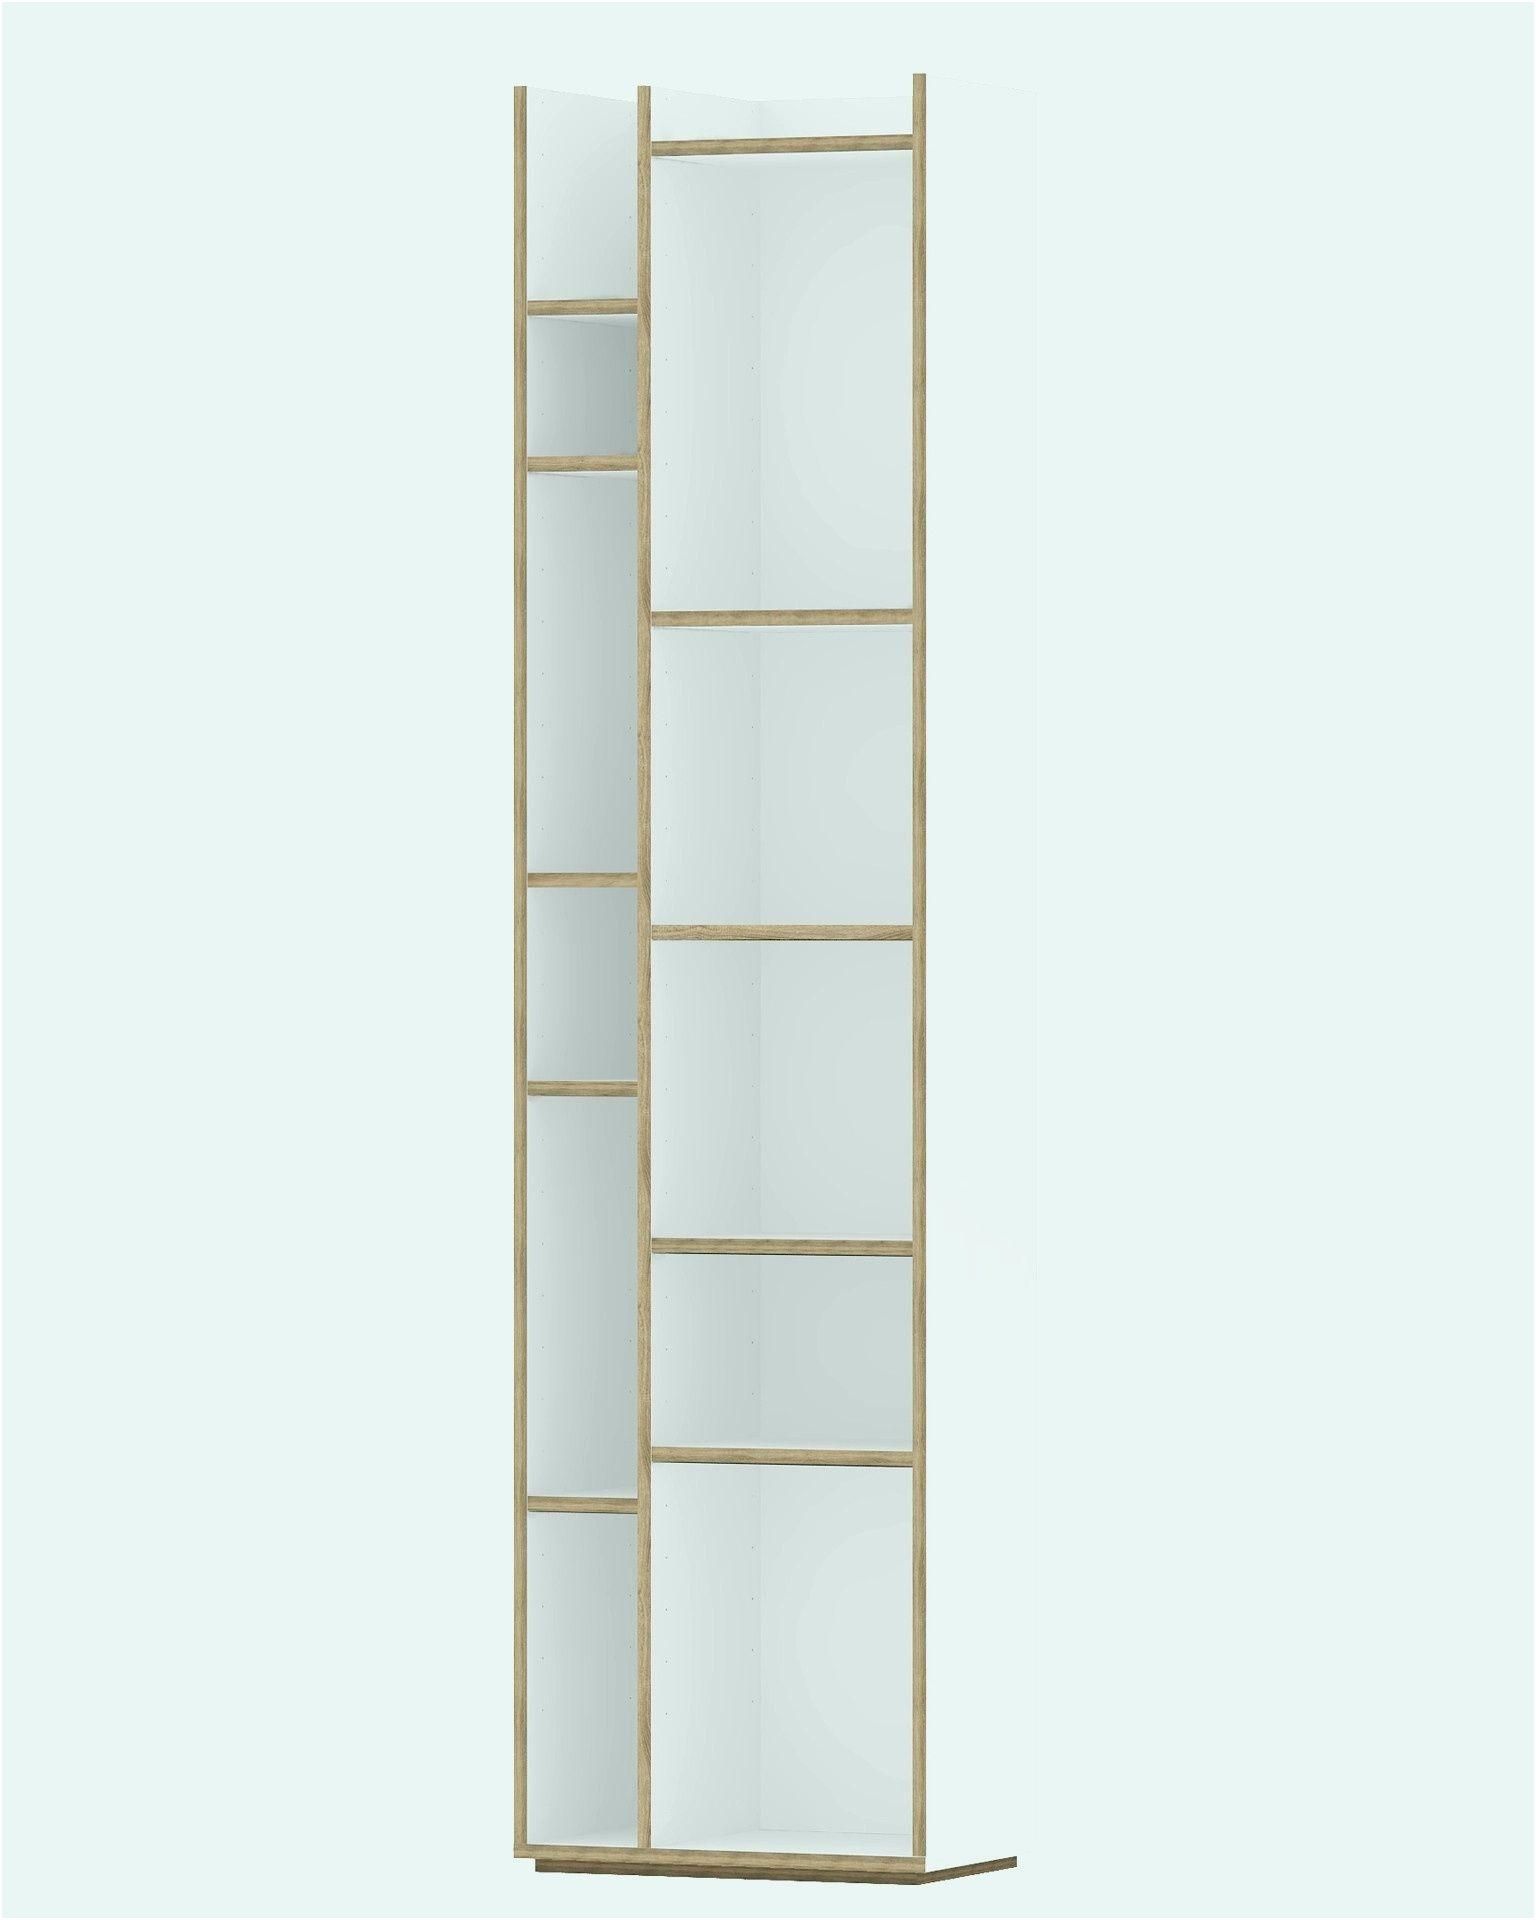 Badezimmer Regal Metall Frisch Badezimmer Regal Schmal Einzigartig Badezimmer Ideen In 2020 Ladder Decor Decor Home Decor